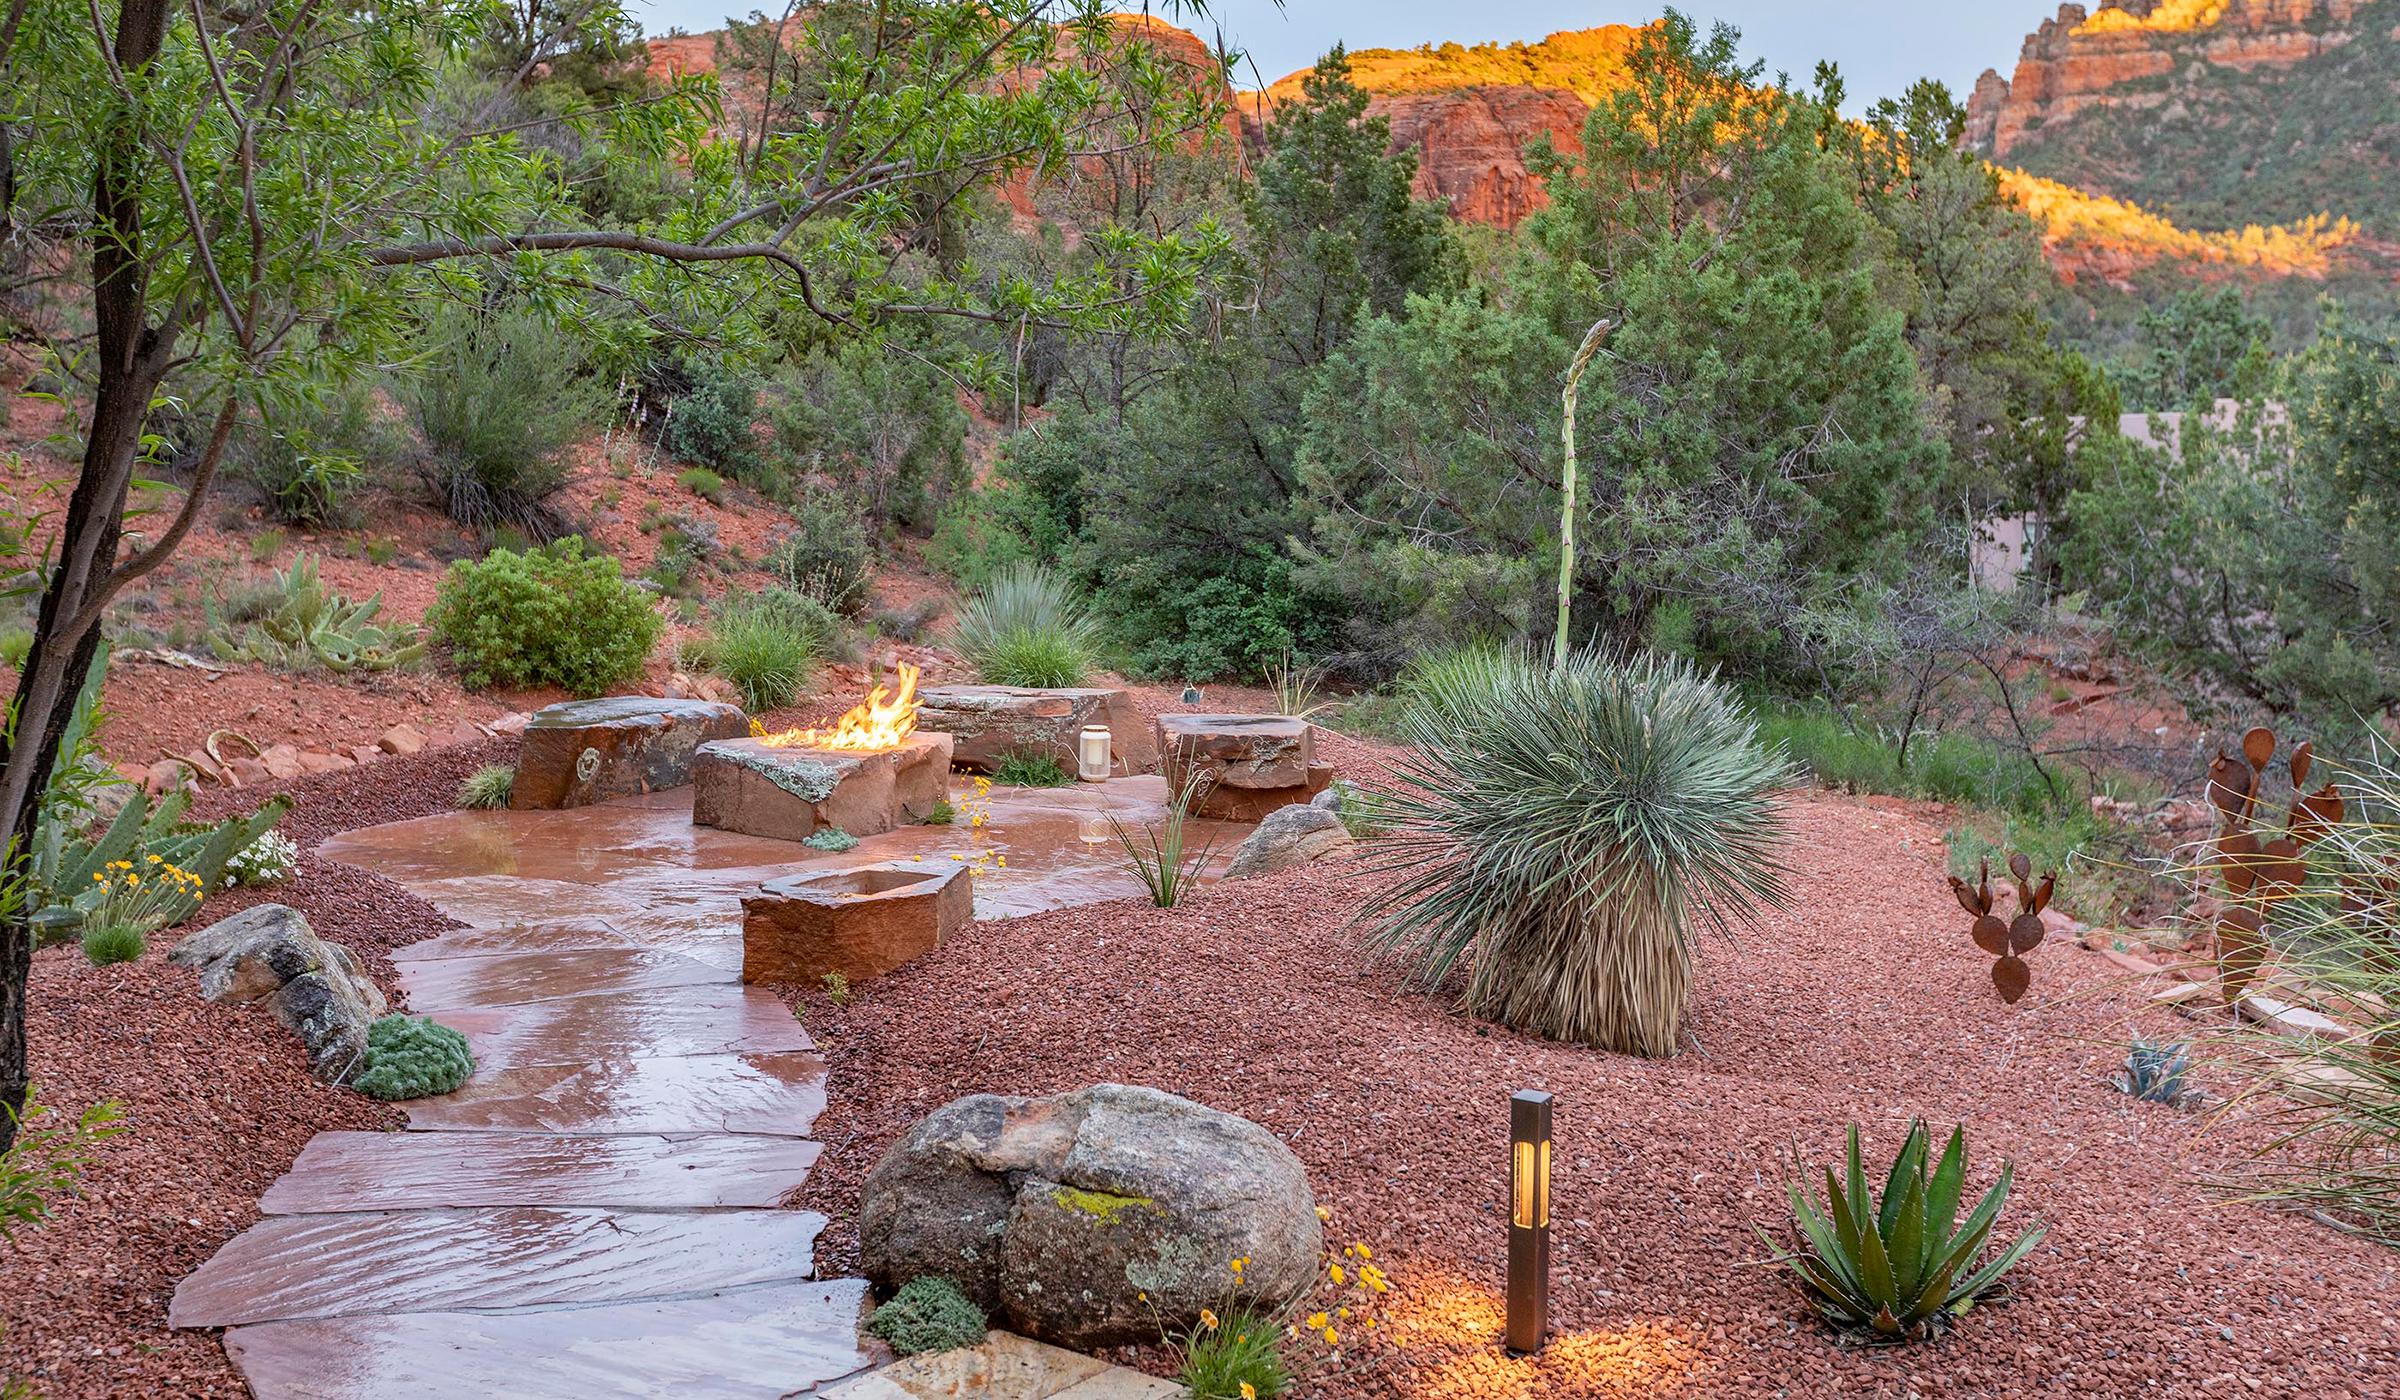 sedona residential landscaping company - flagstone patio